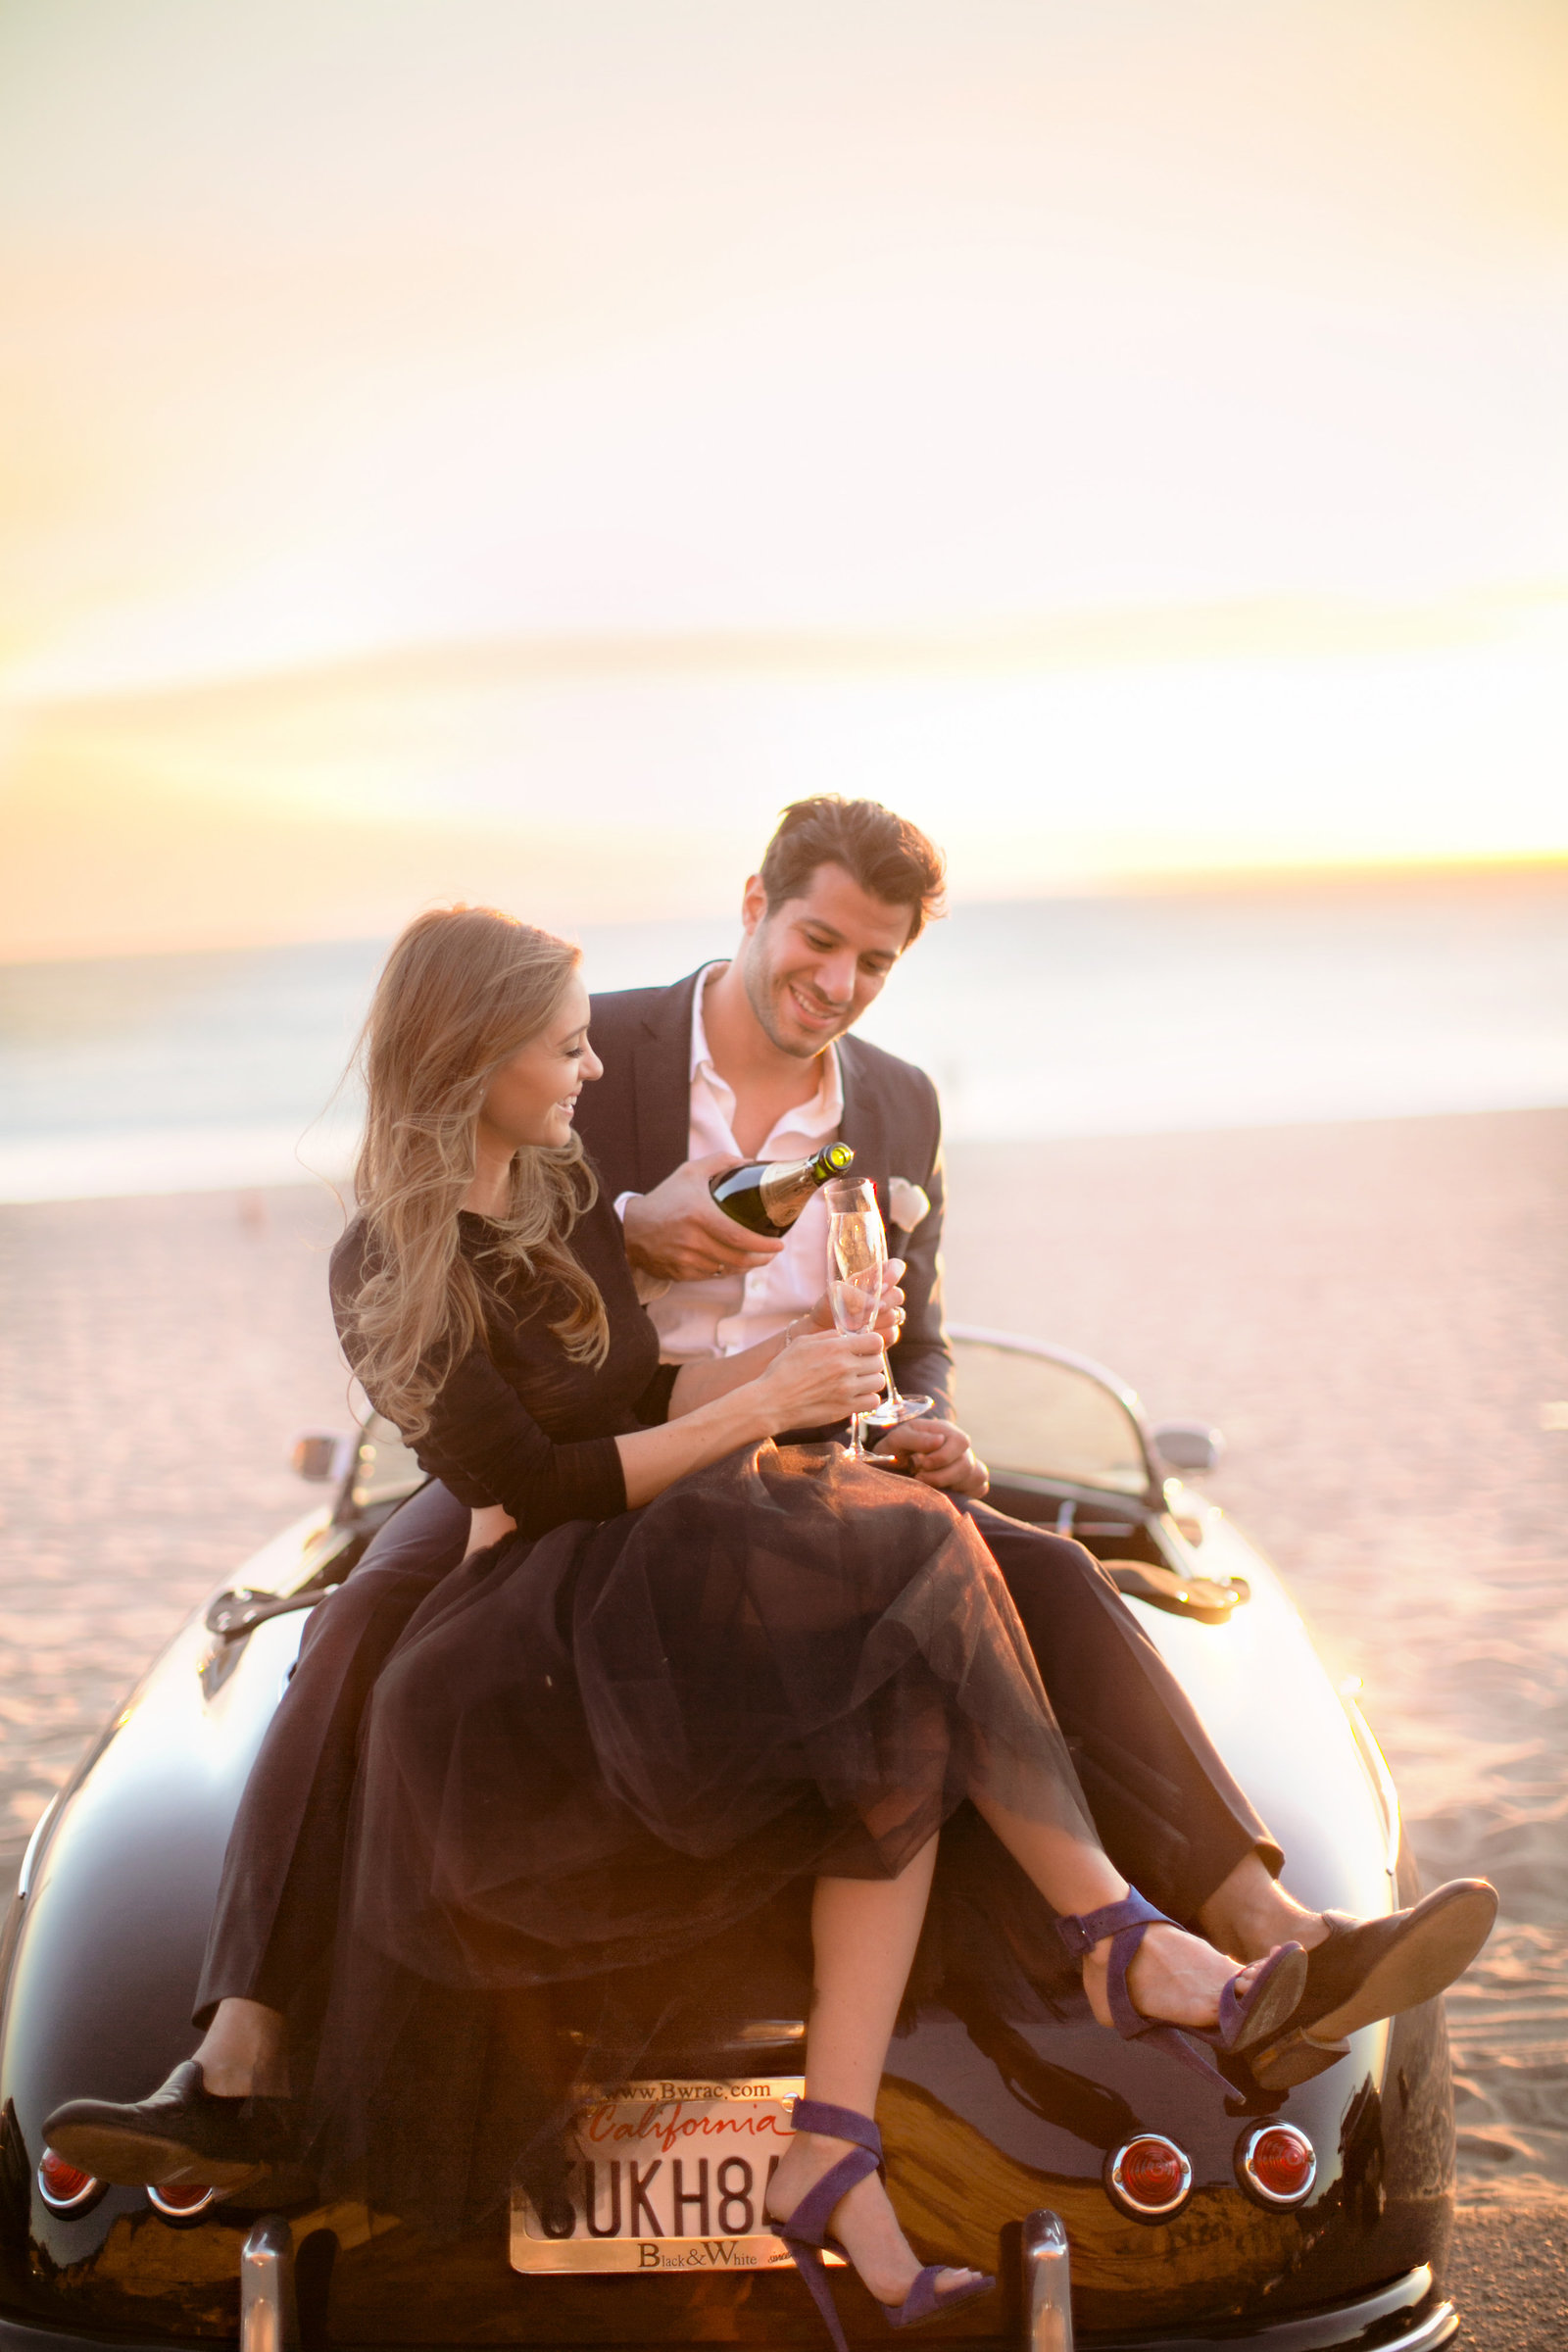 SOUTHERN_CALIFORNIA_WEDDING_PHOTOGRAPHER_JANA_WILLIAMS_bhldn-117-2